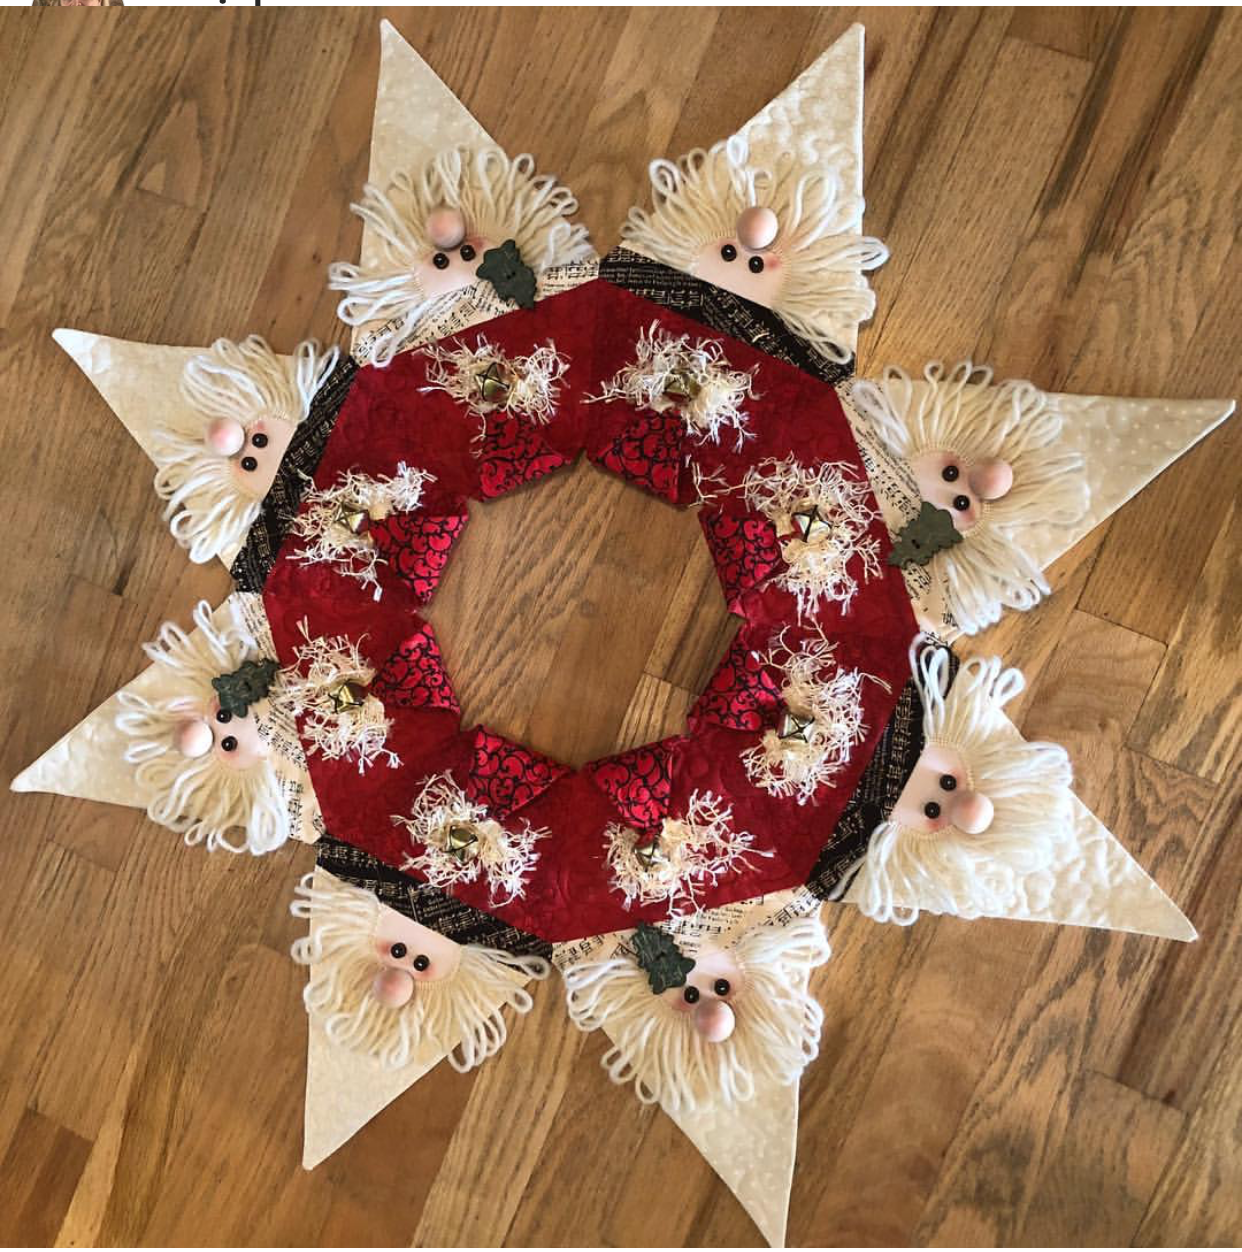 Jingle Bell Wreath Fabric Kit